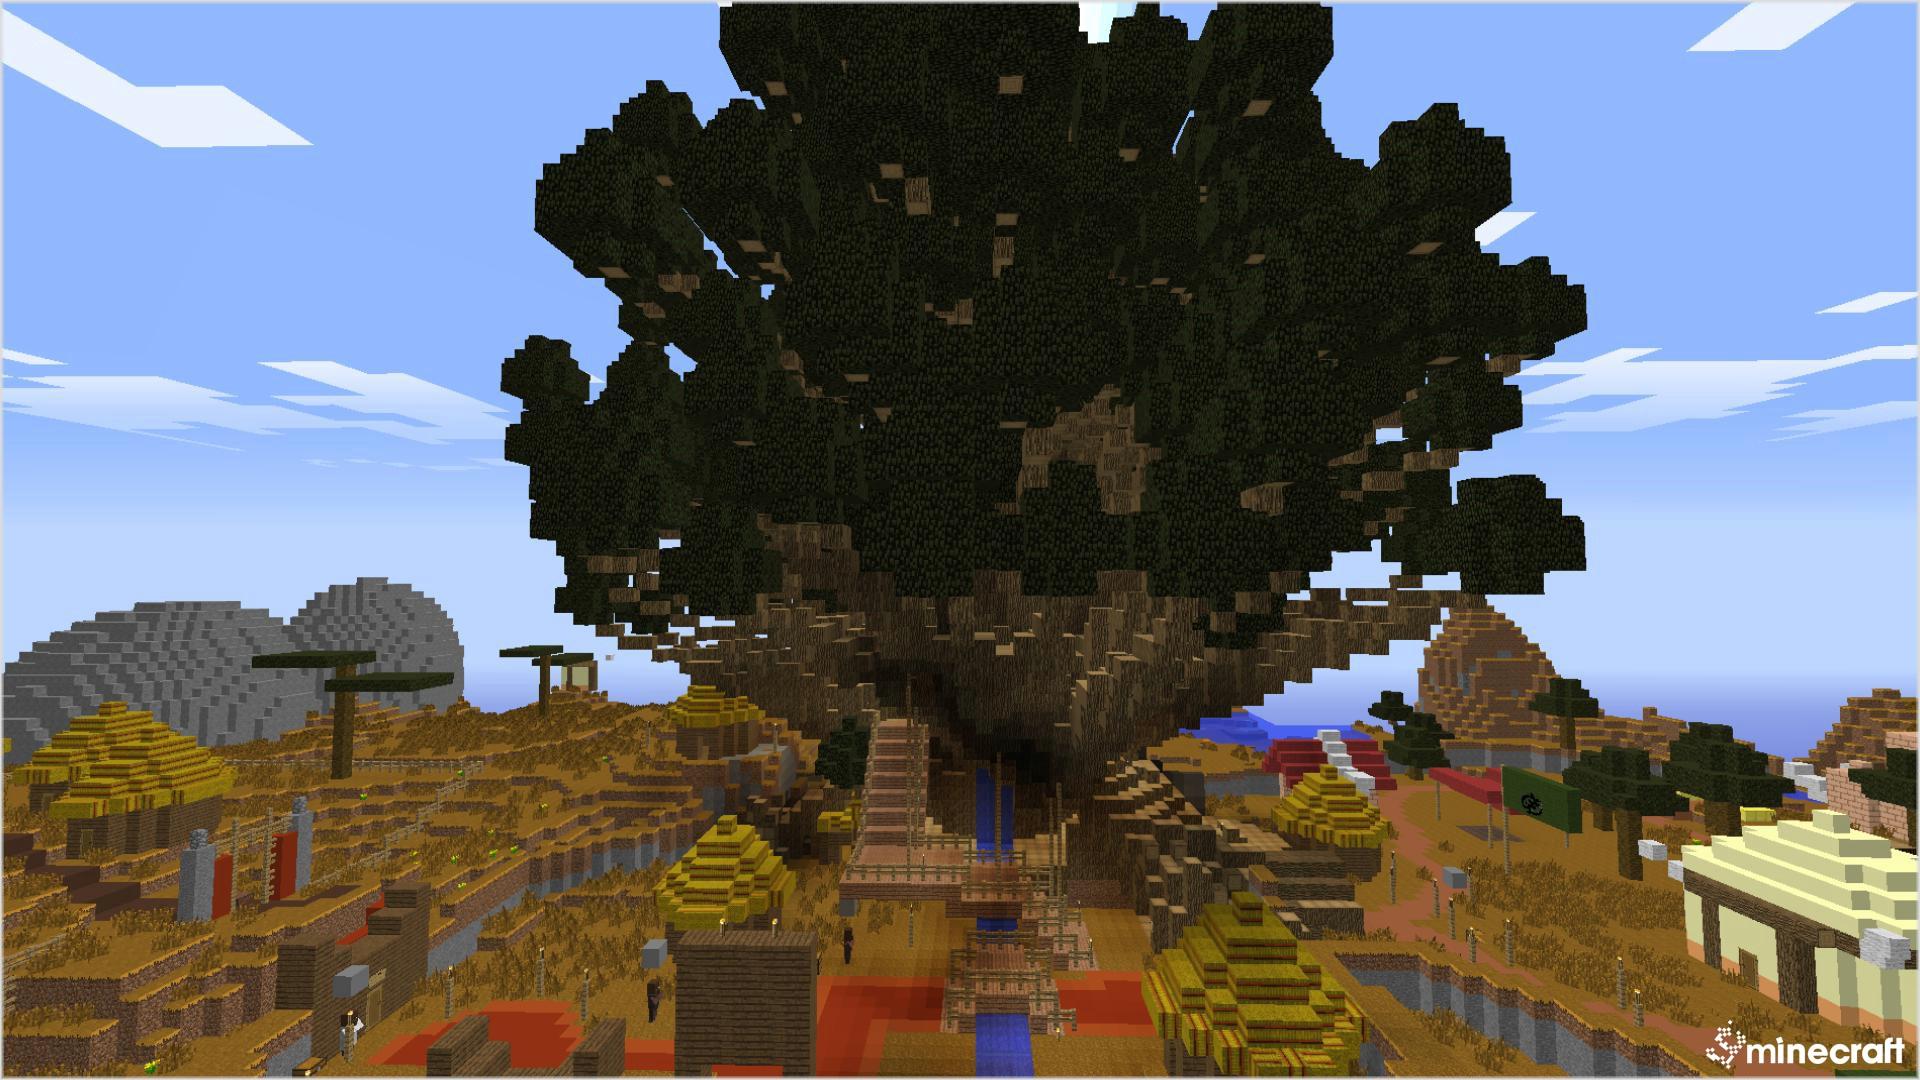 http://minecraft-forum.net/wp-content/uploads/2013/12/c6383__The-Safari-Map-1.jpg